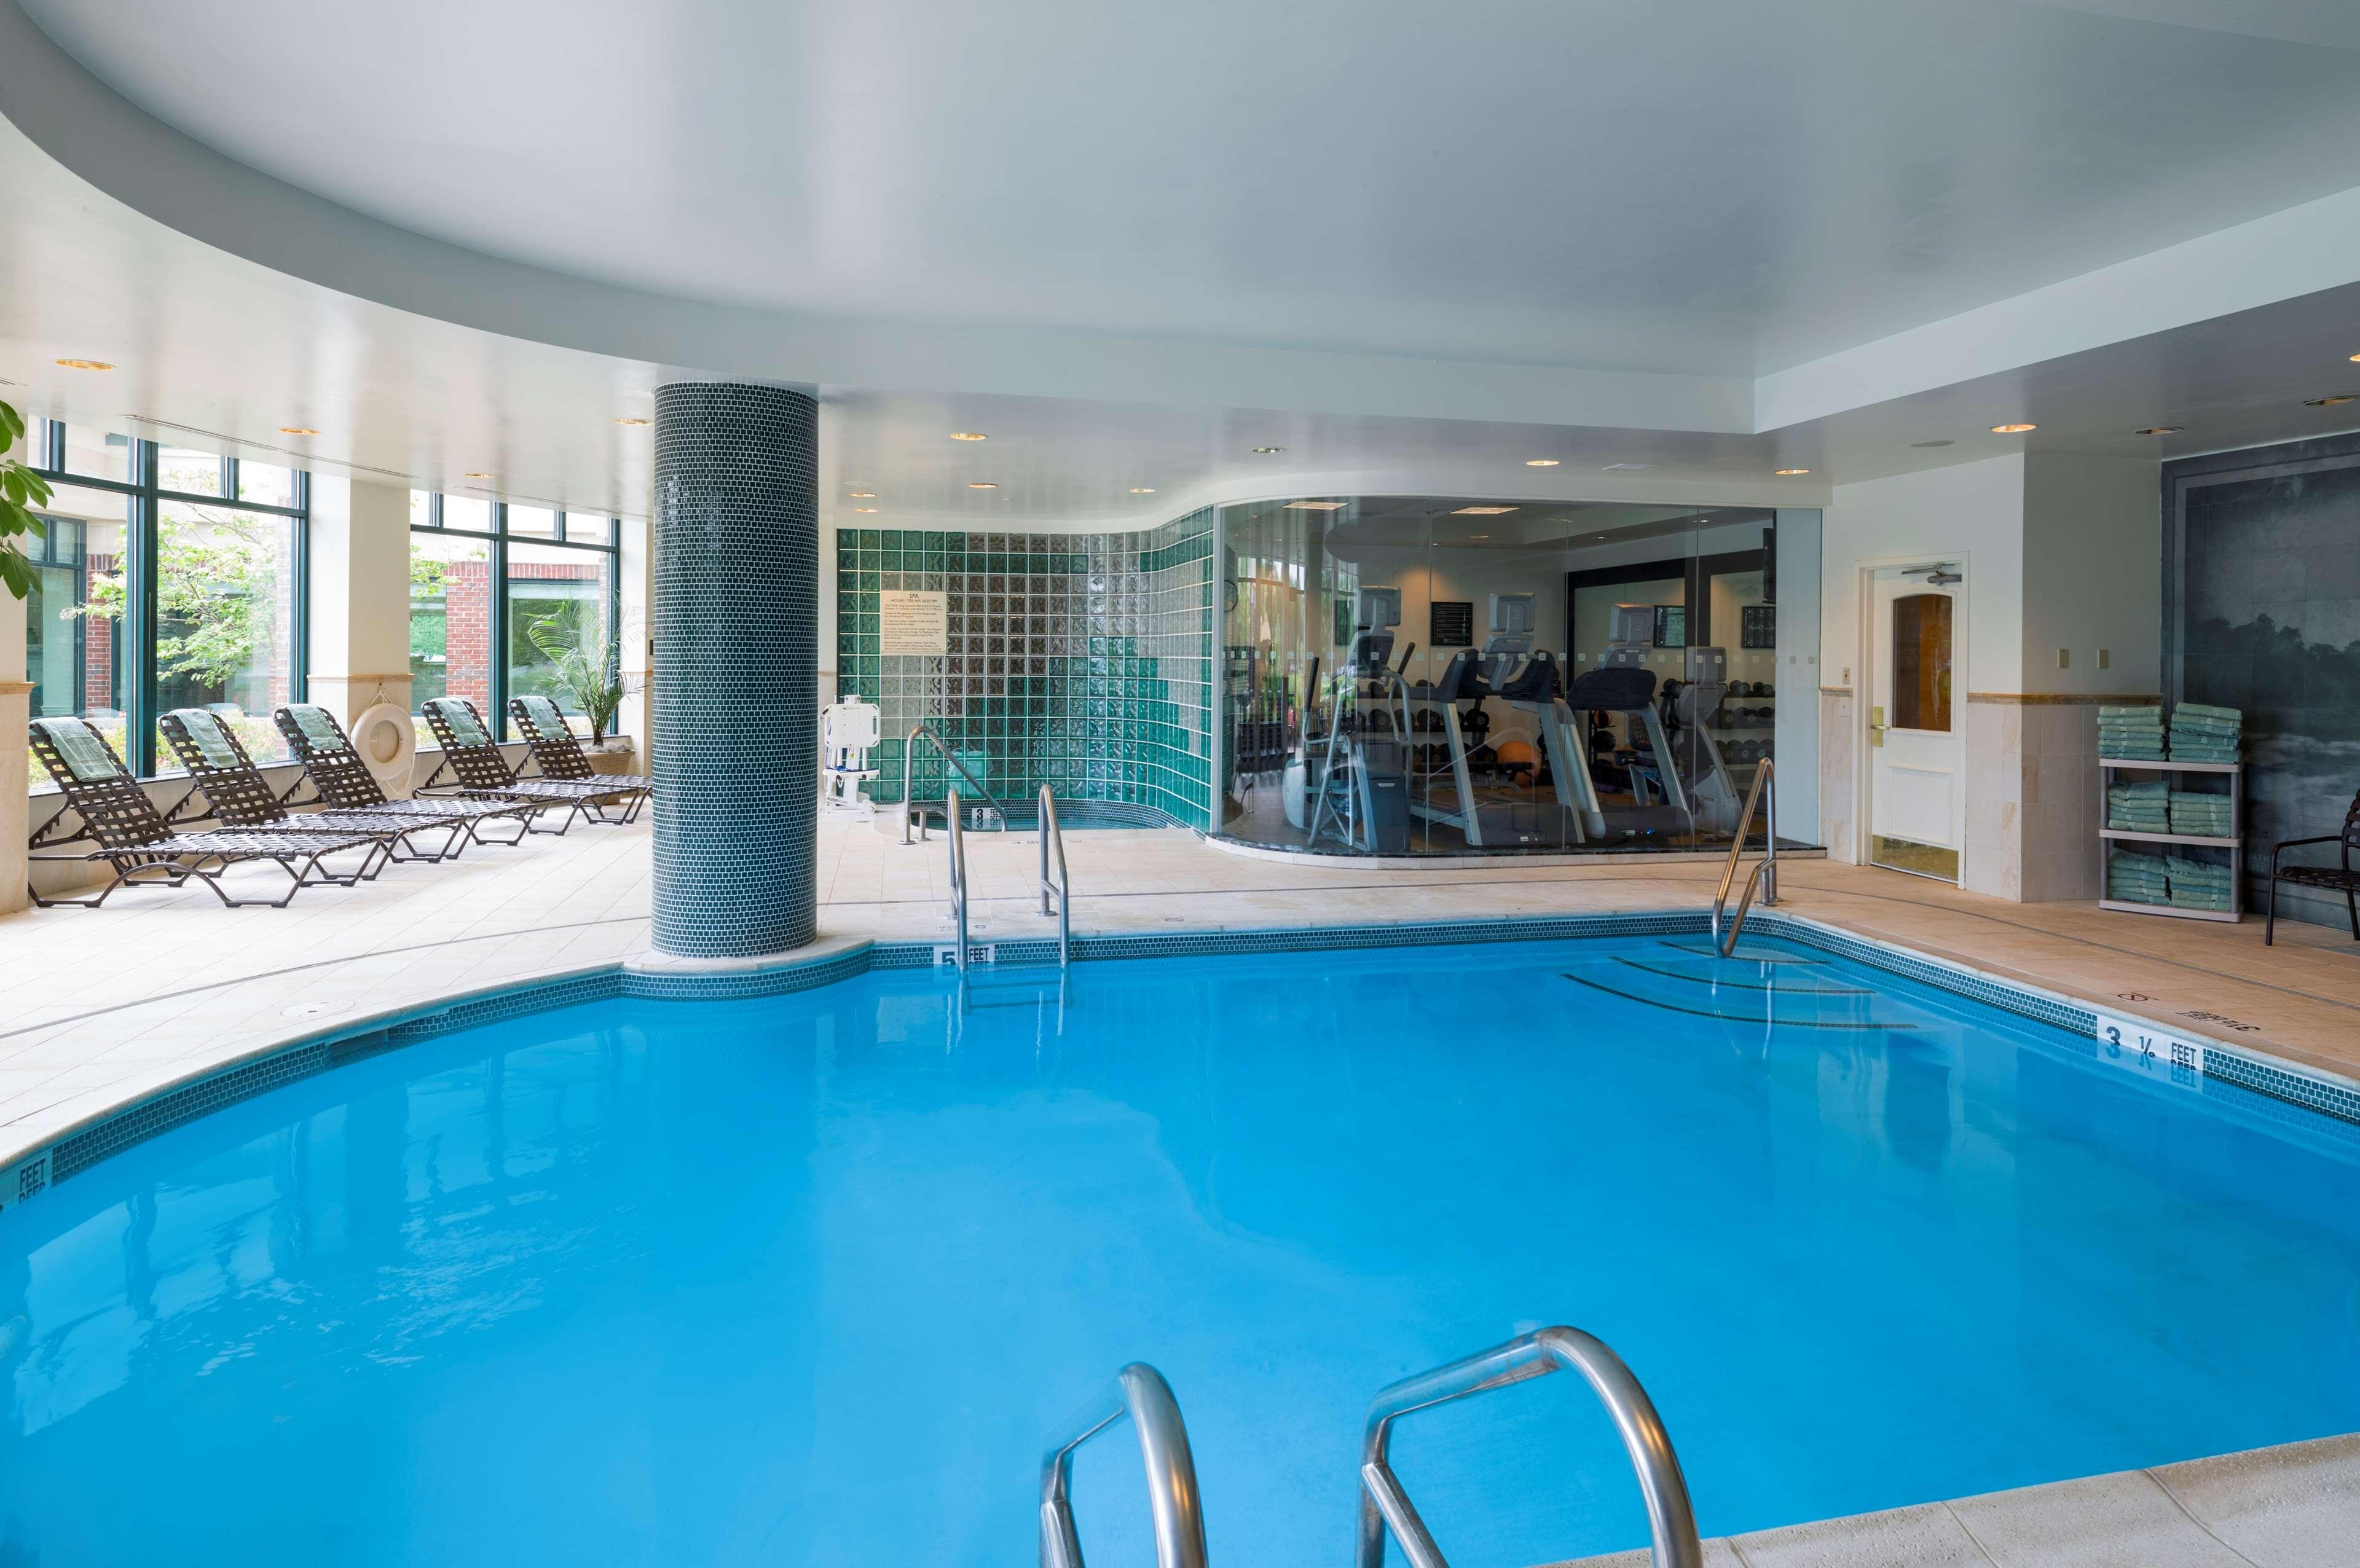 Hilton Garden Inn Hartford South/Glastonbury image 9